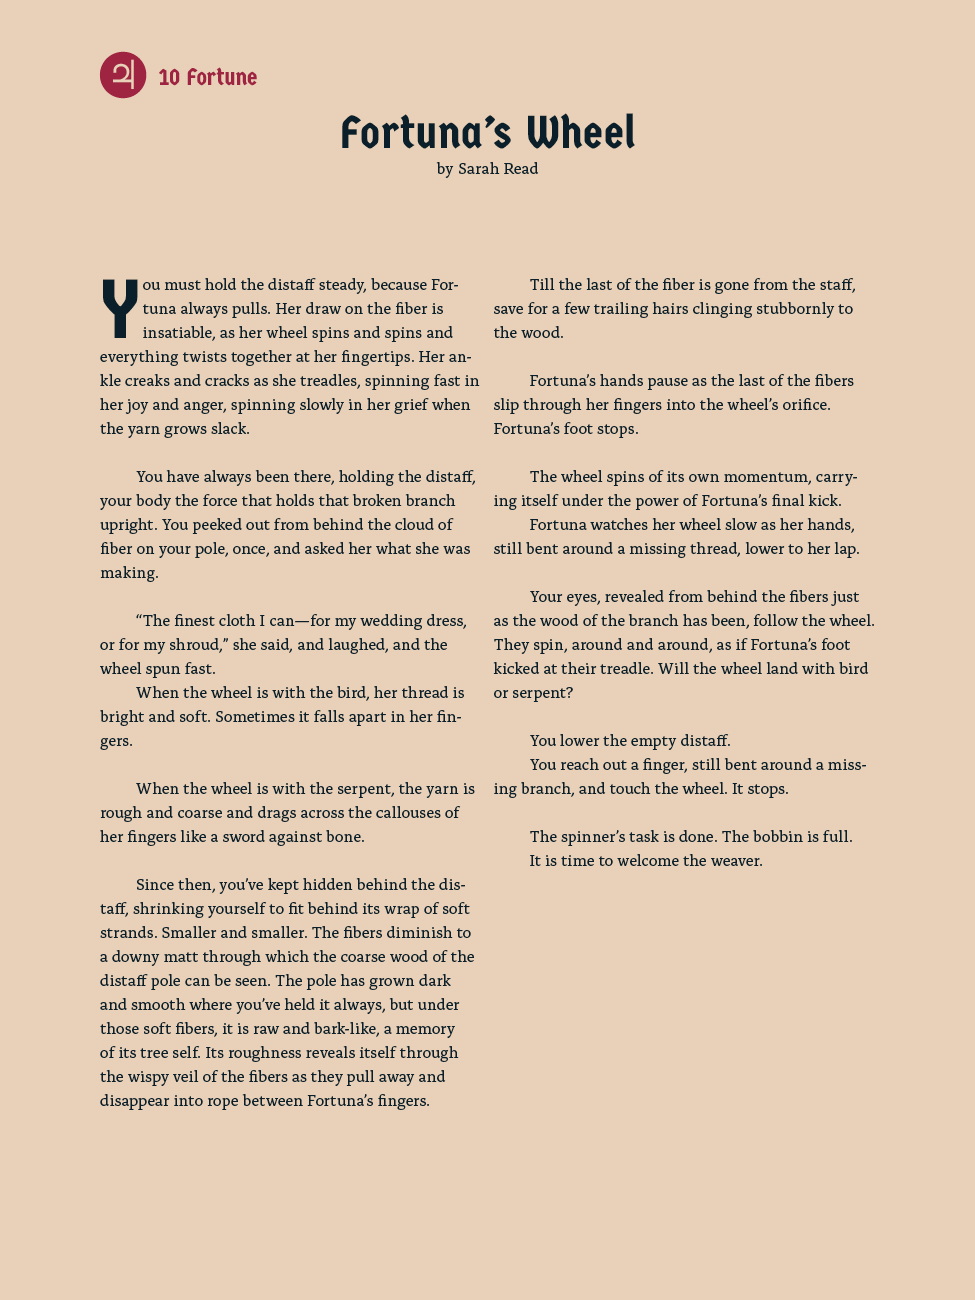 10 The Wheel - Fortuna's Wheel - Sarah Read